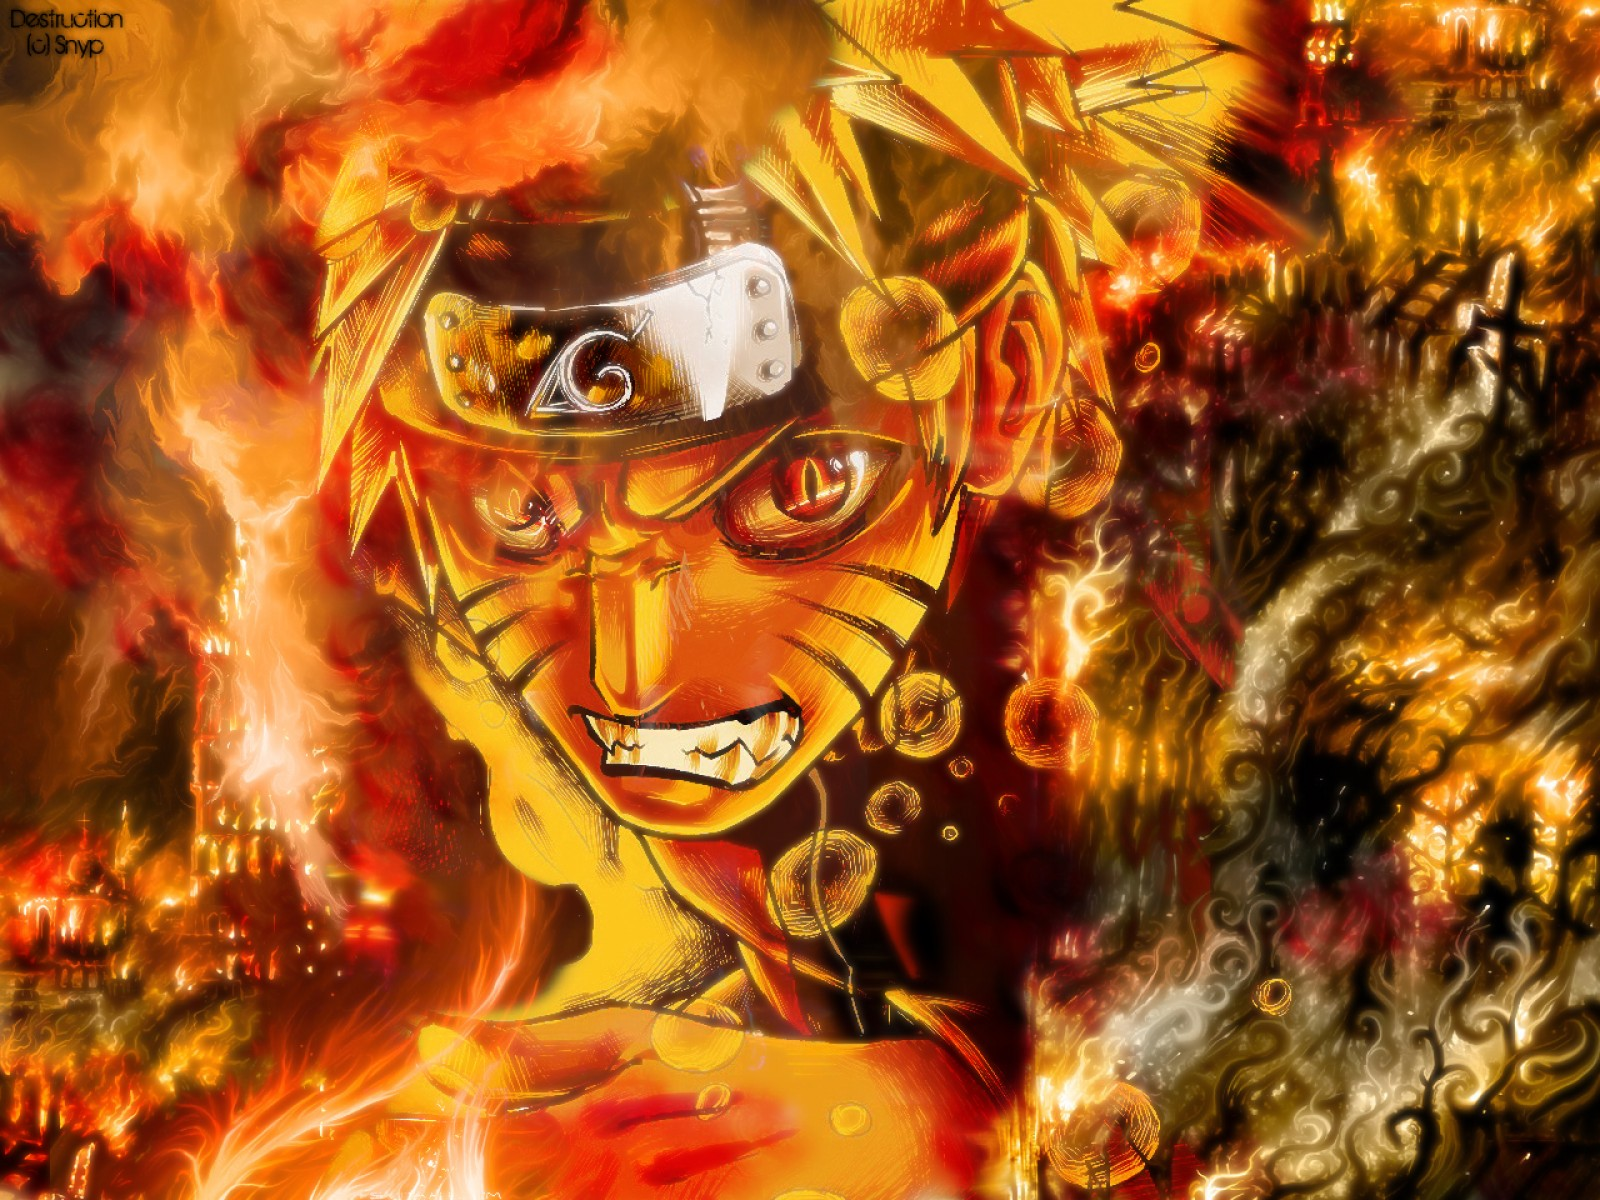 Naruto Shippuden Wallpapers 1600x1200